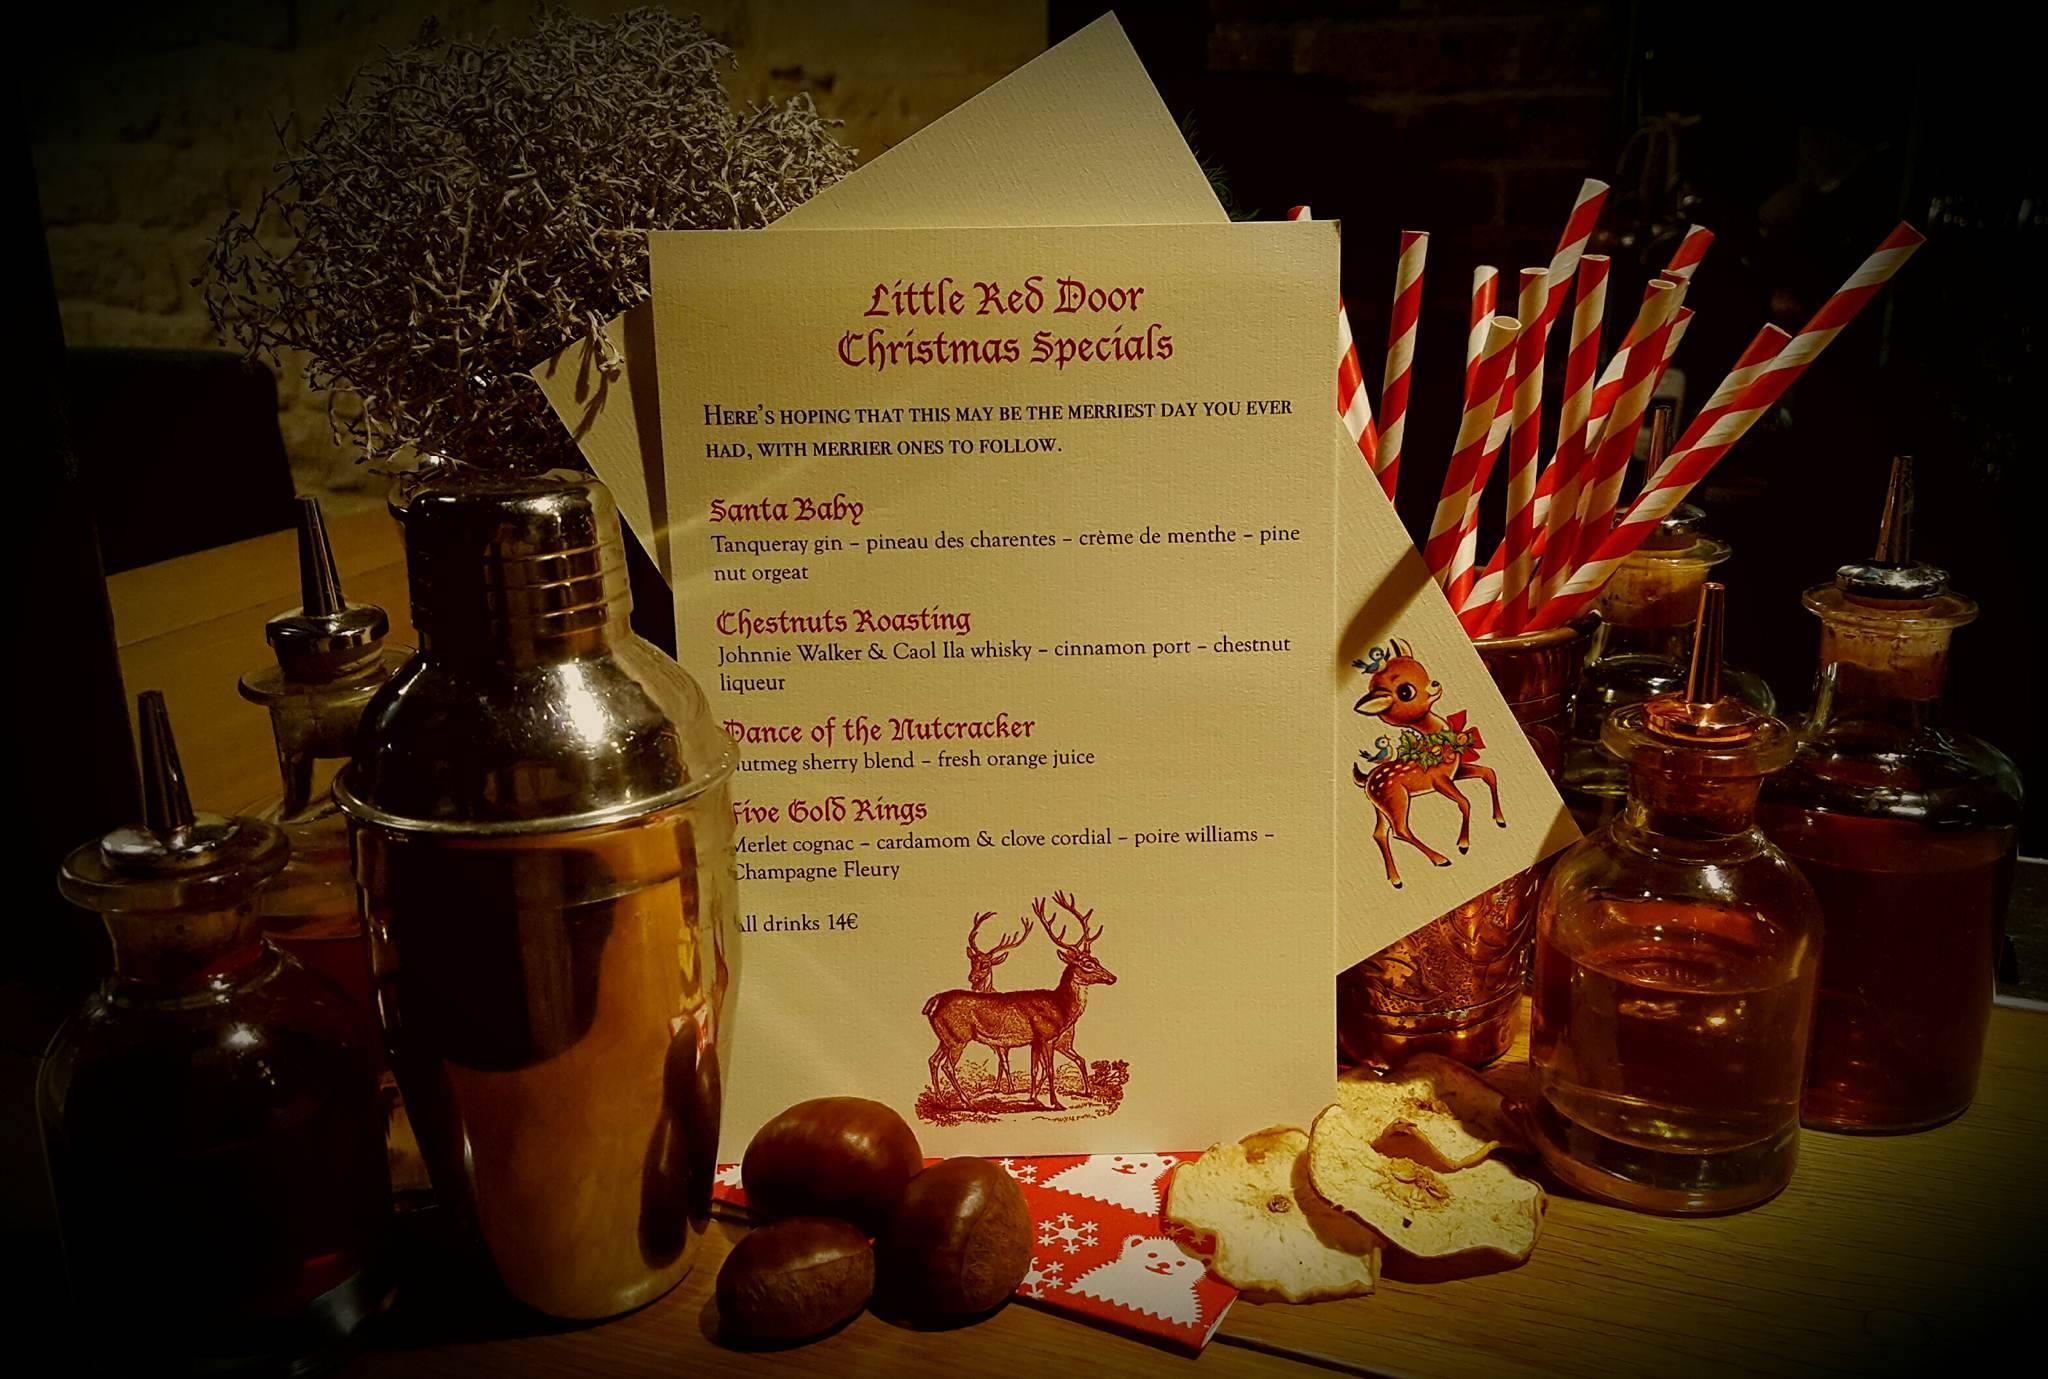 Little Red Door Christmas Specials 52 Martinis